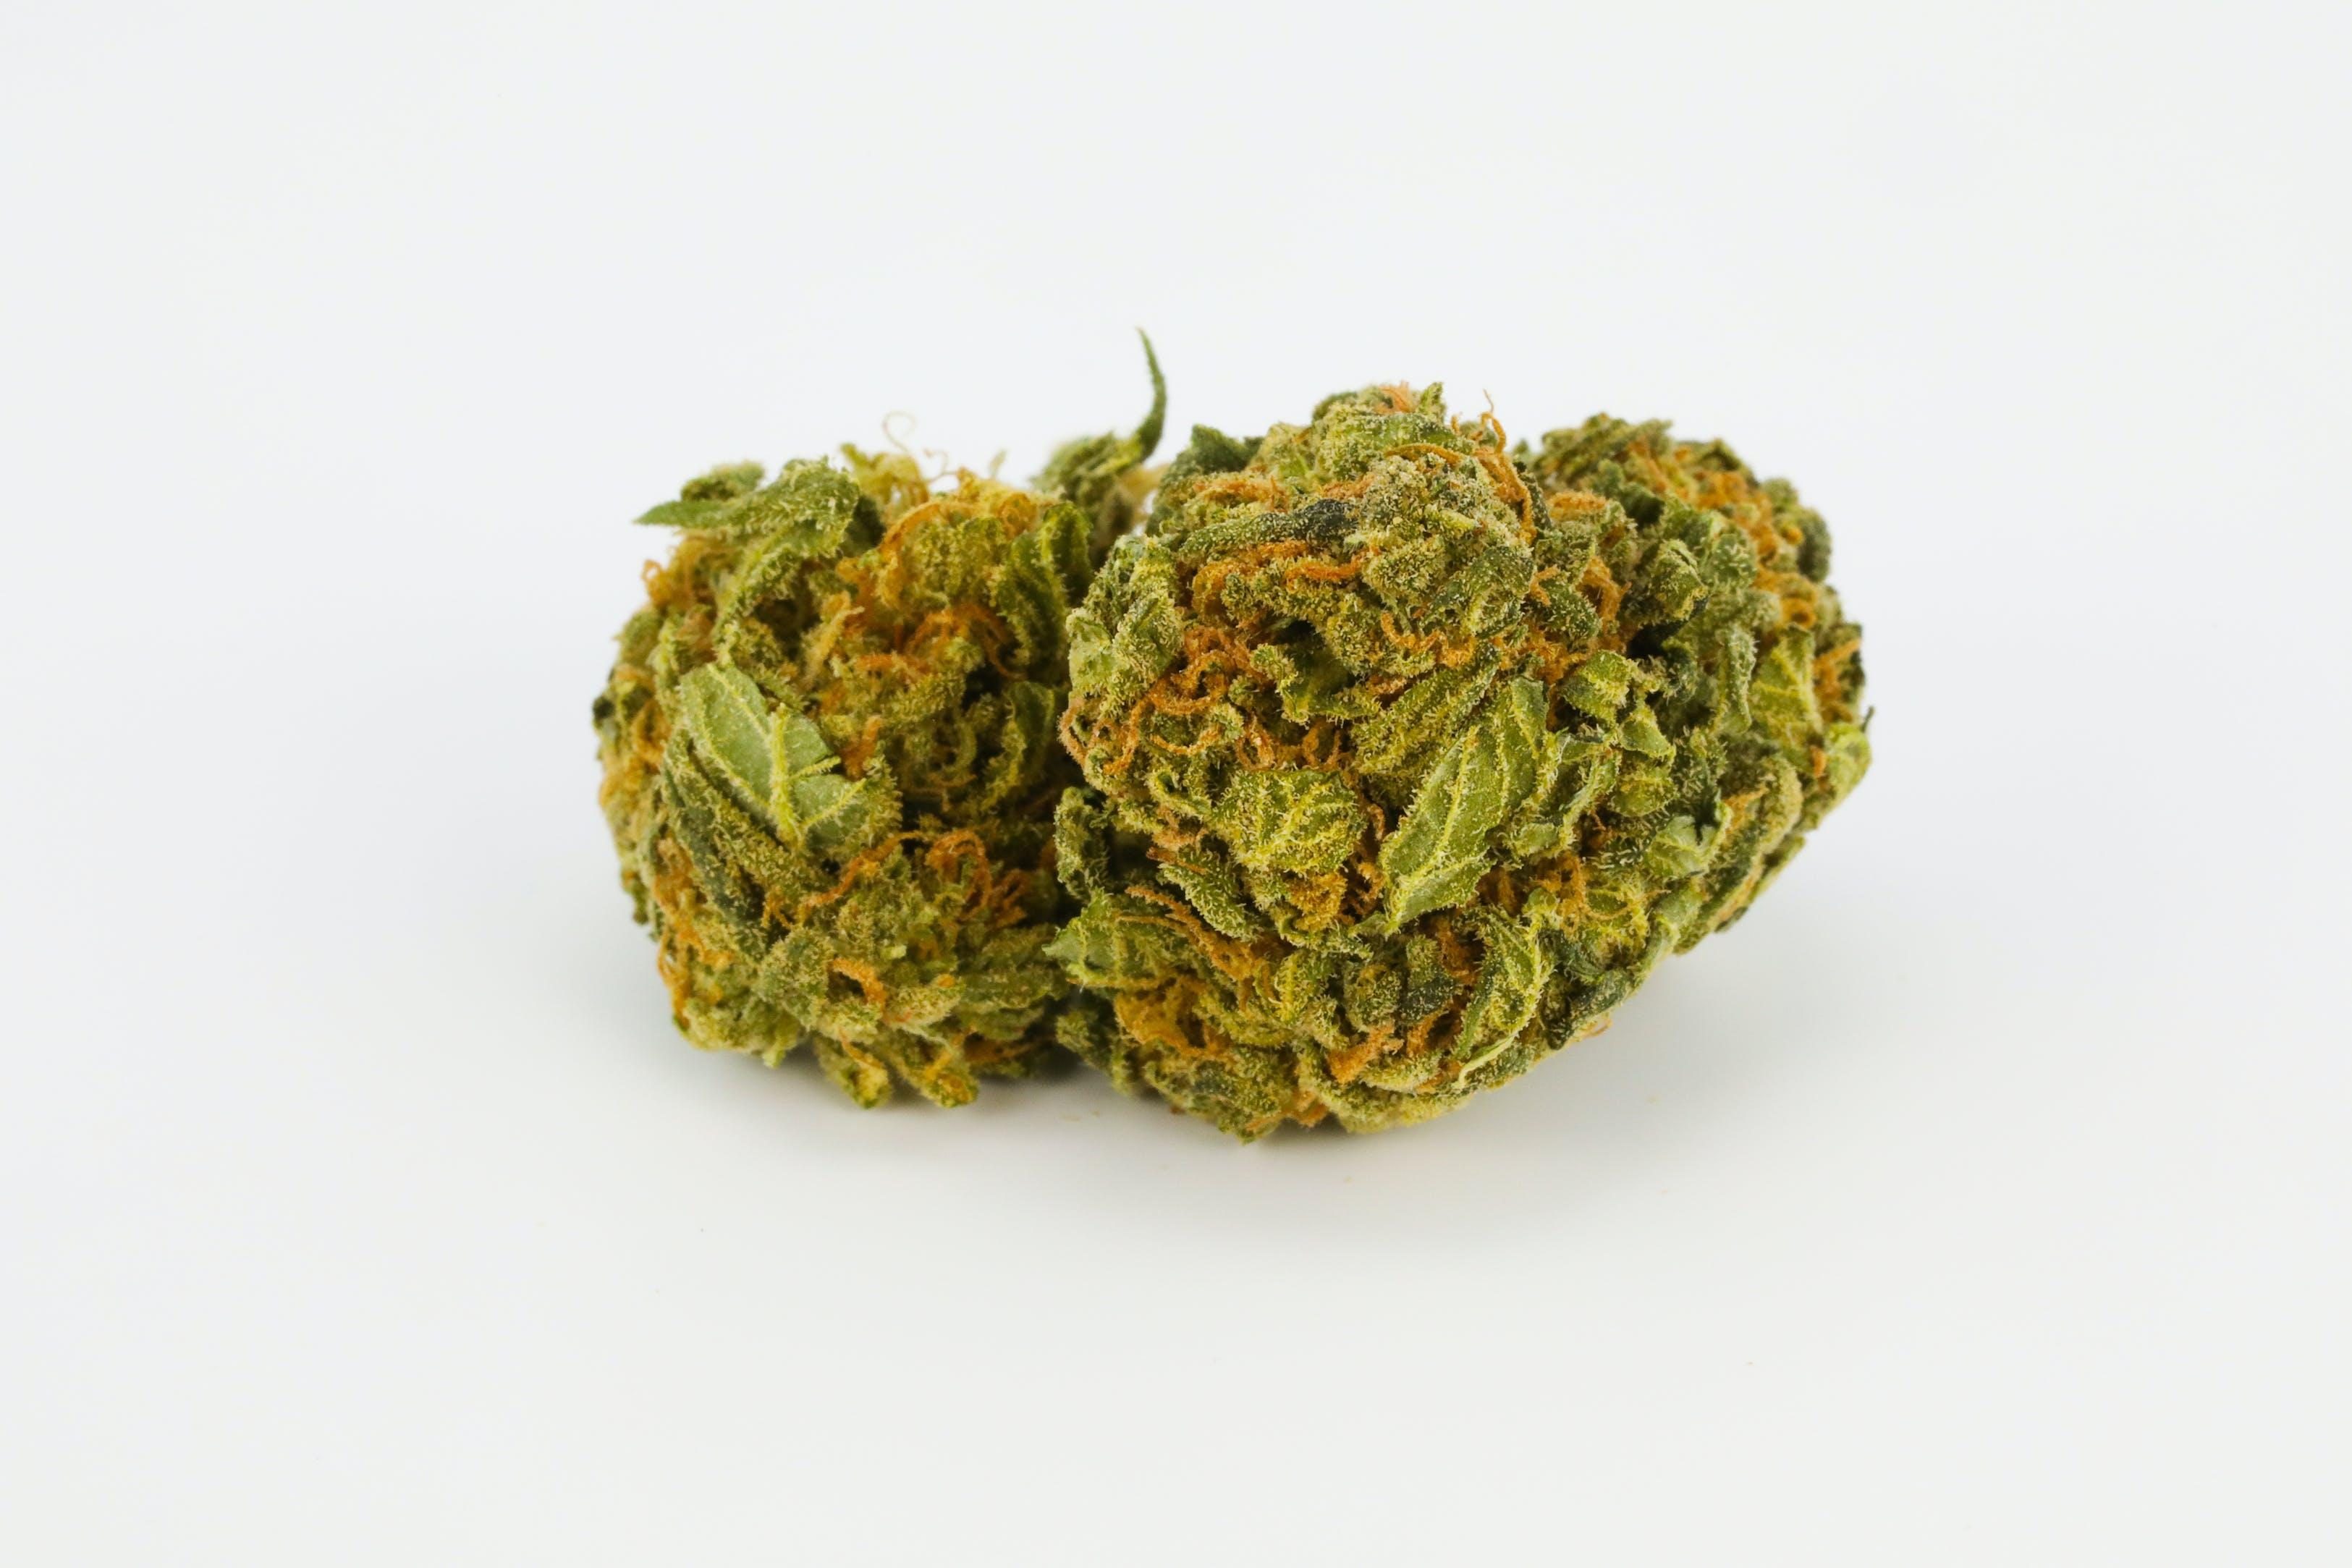 Middlefork Weed; Middlefork Cannabis Strain; Middlefork Hybrid Marijuana Strain